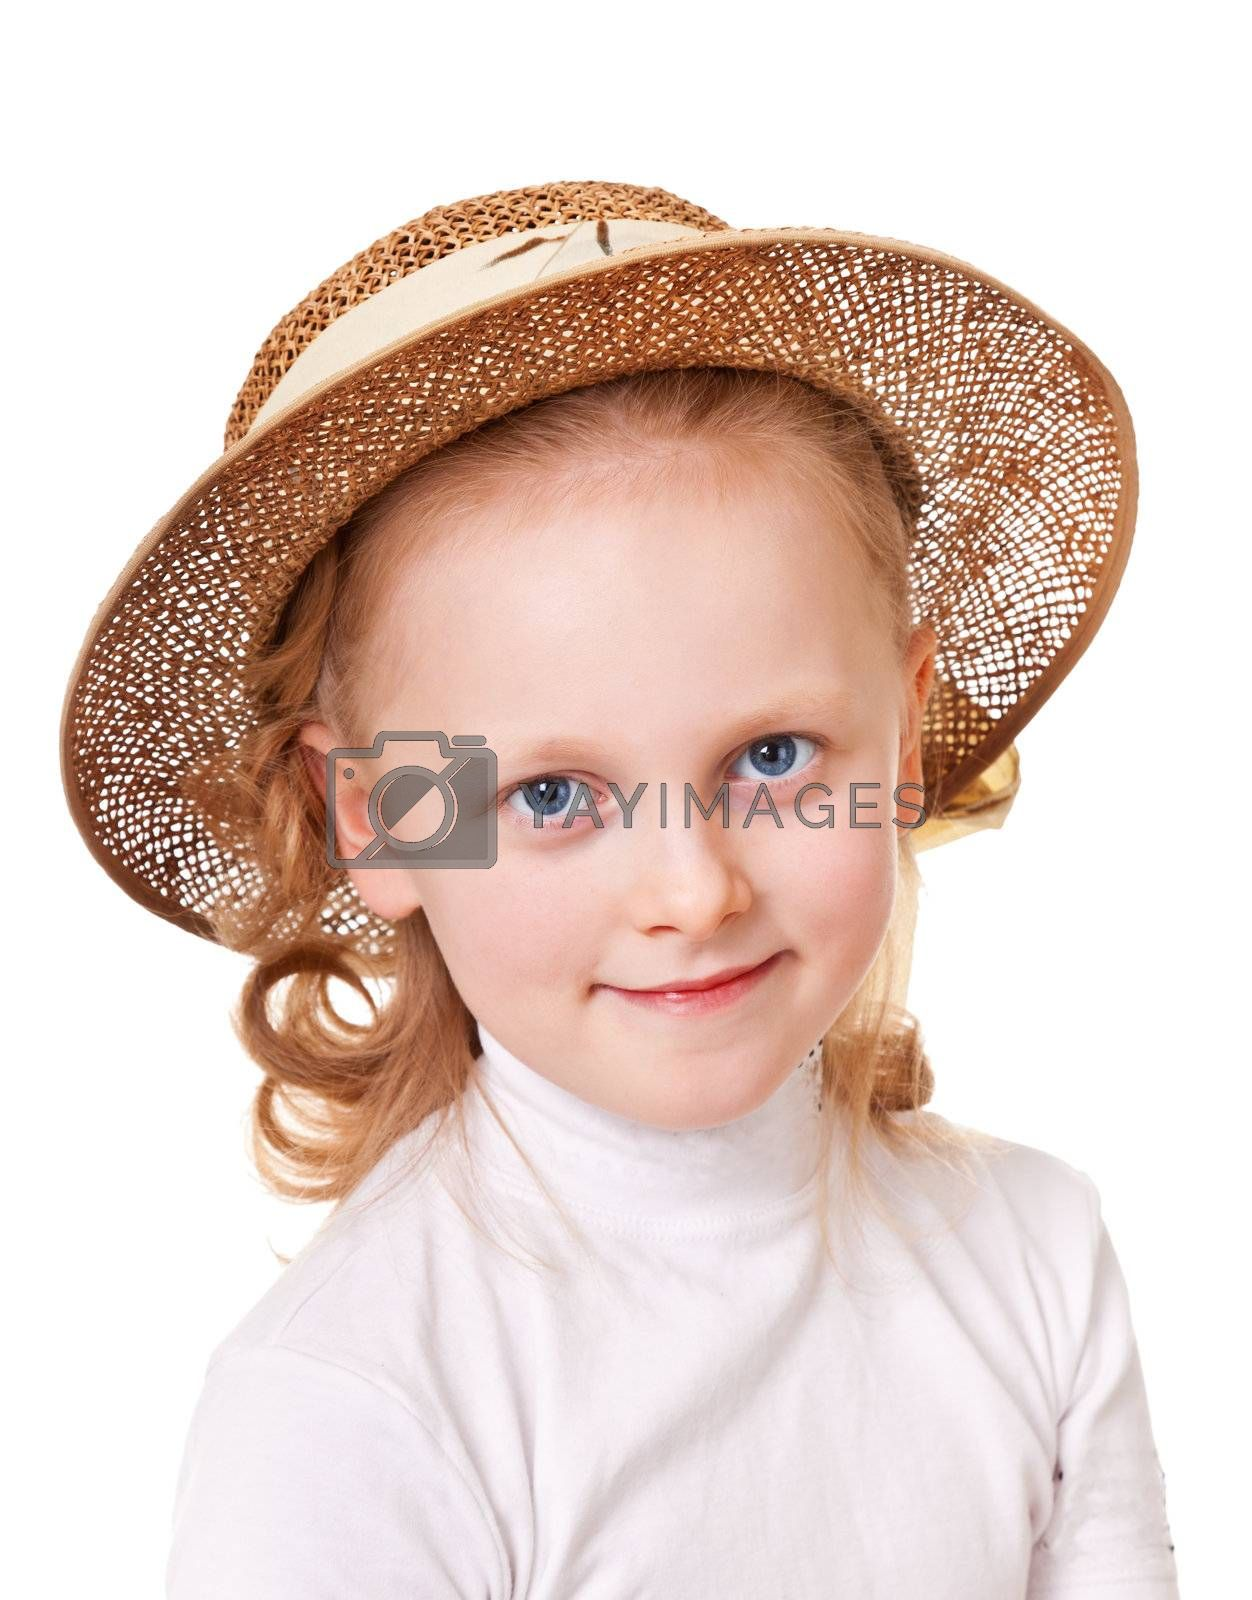 Portrait of schoolgirls in a straw hat on a white background